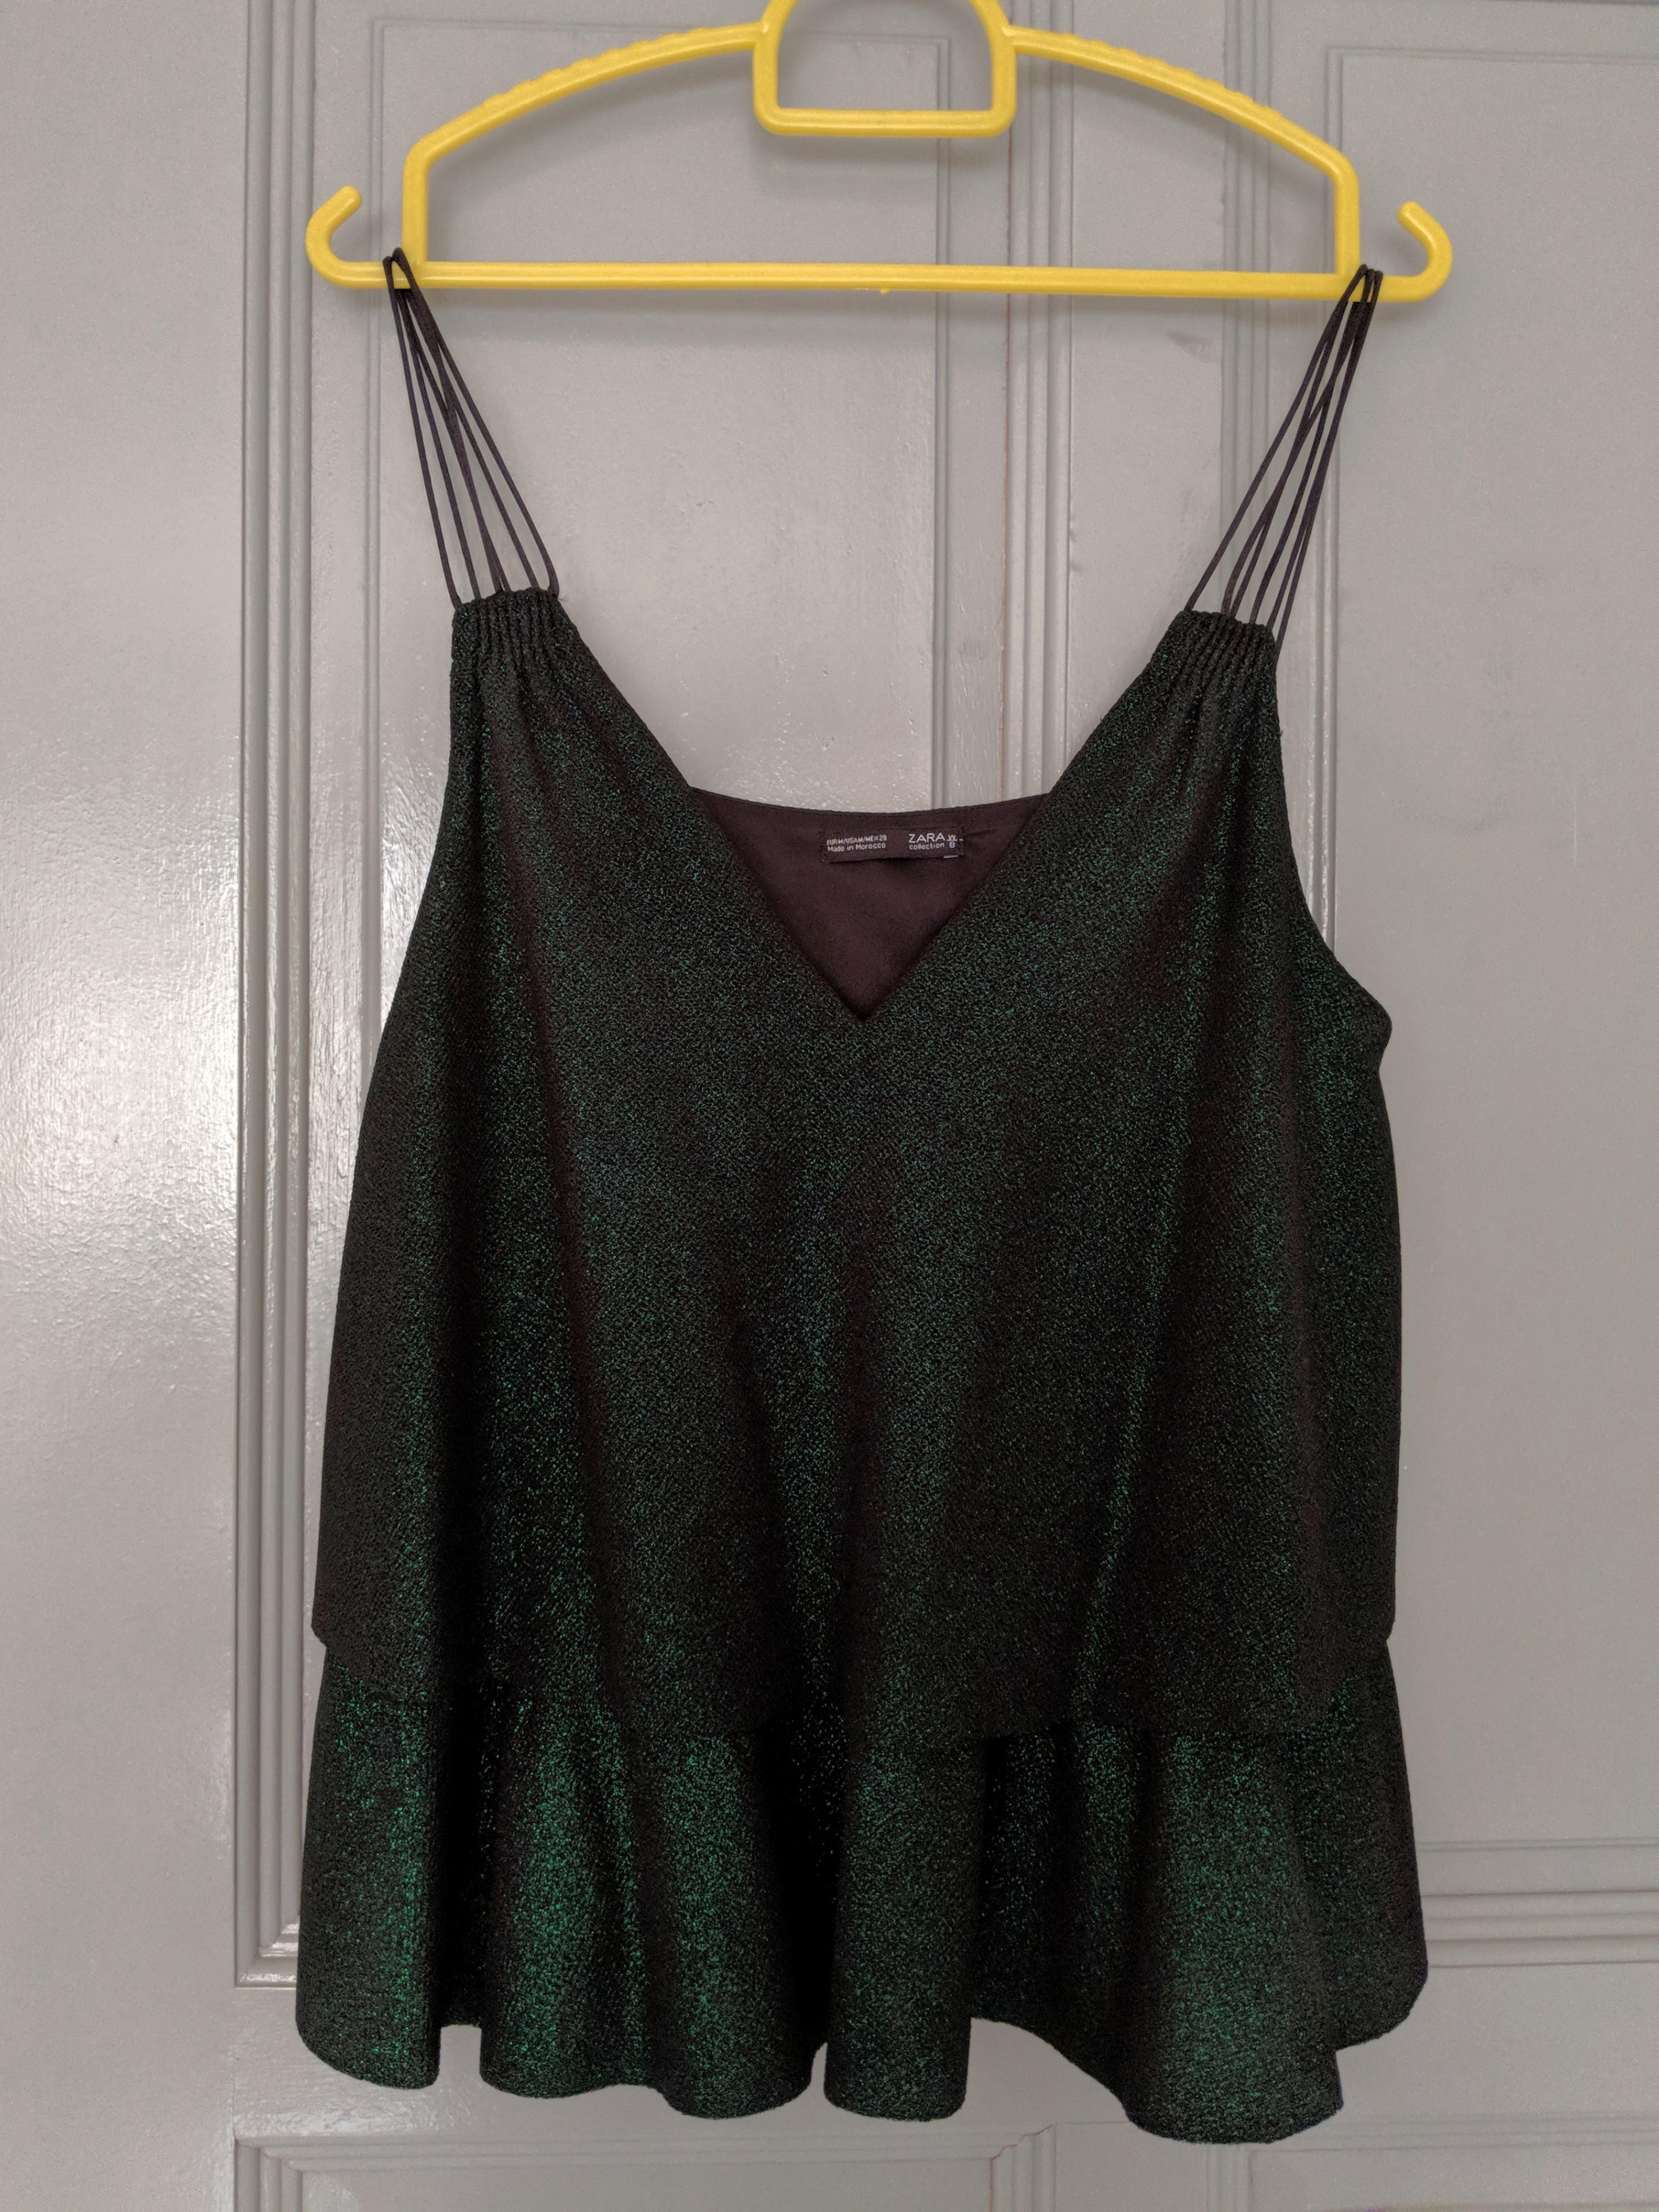 ab8f256c ZARA Emerald green glittery a-line tank top, Women's Fashion ...